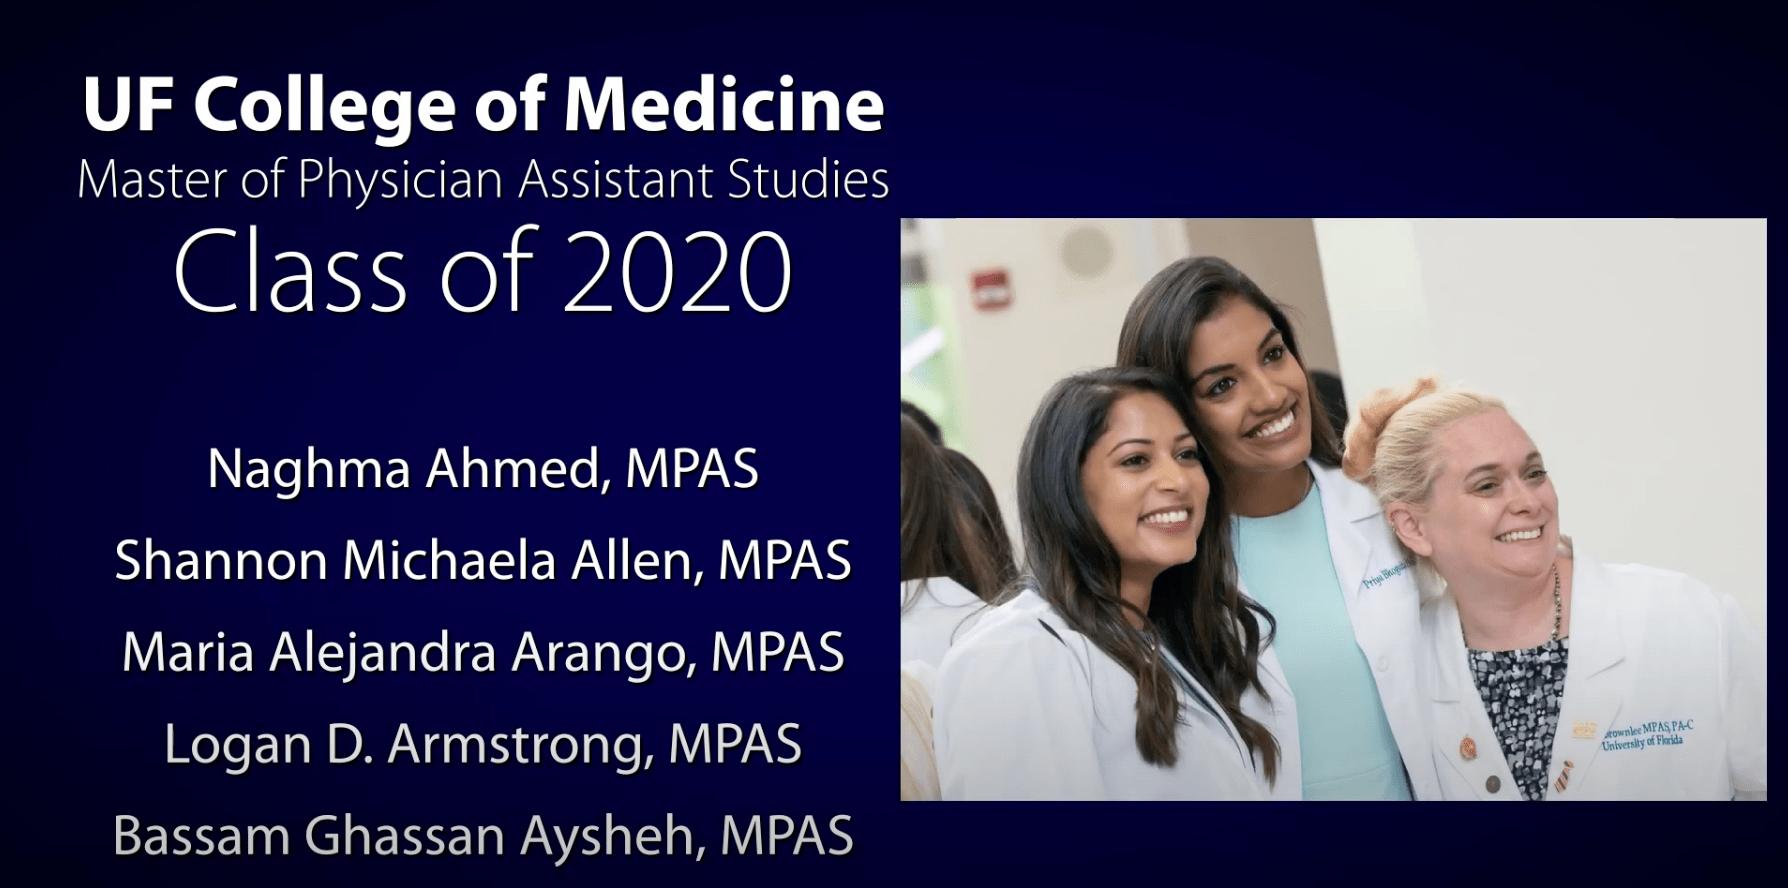 U-F College of Medicine School of P-A Studies list of graduates